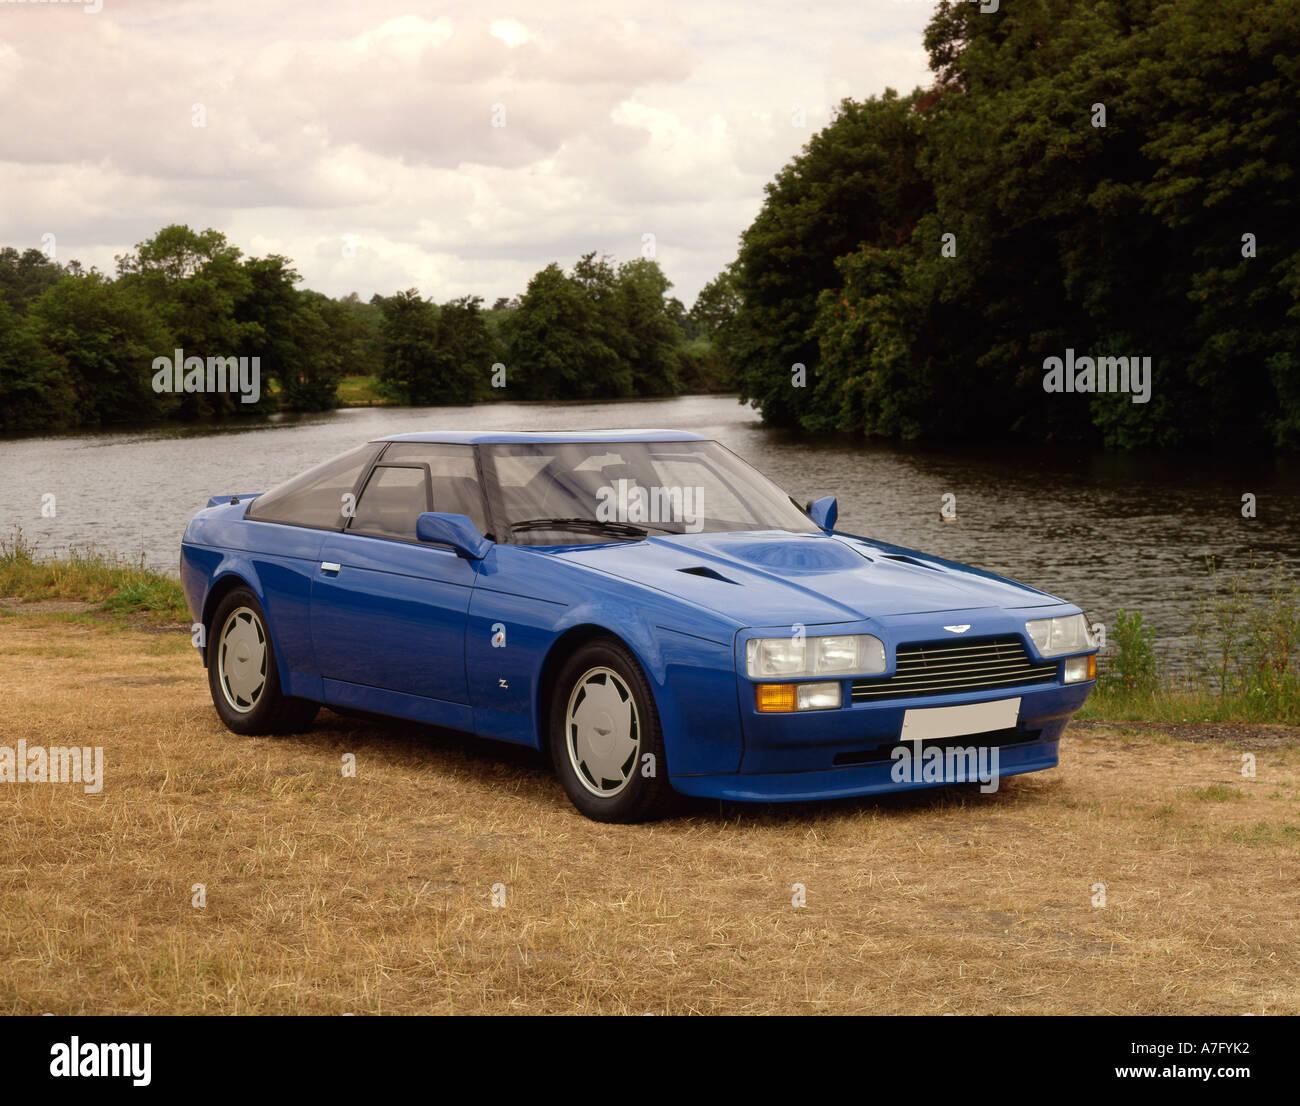 1986 Aston Martin Vantage Zagato V8 Stock Photo Alamy